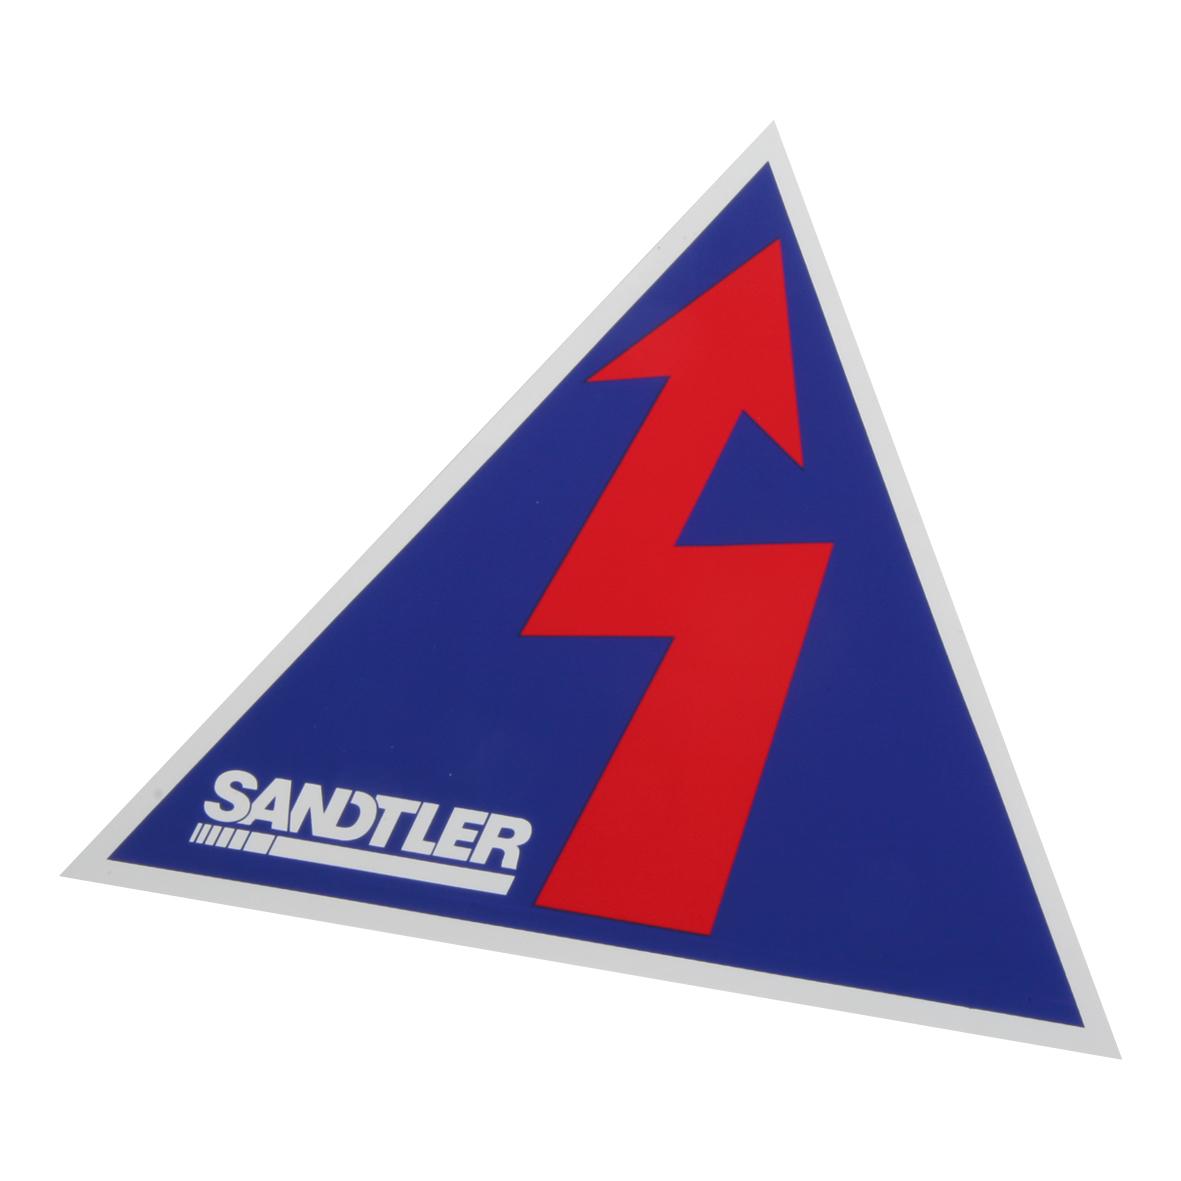 Sandtler Blitz-Aufkleber